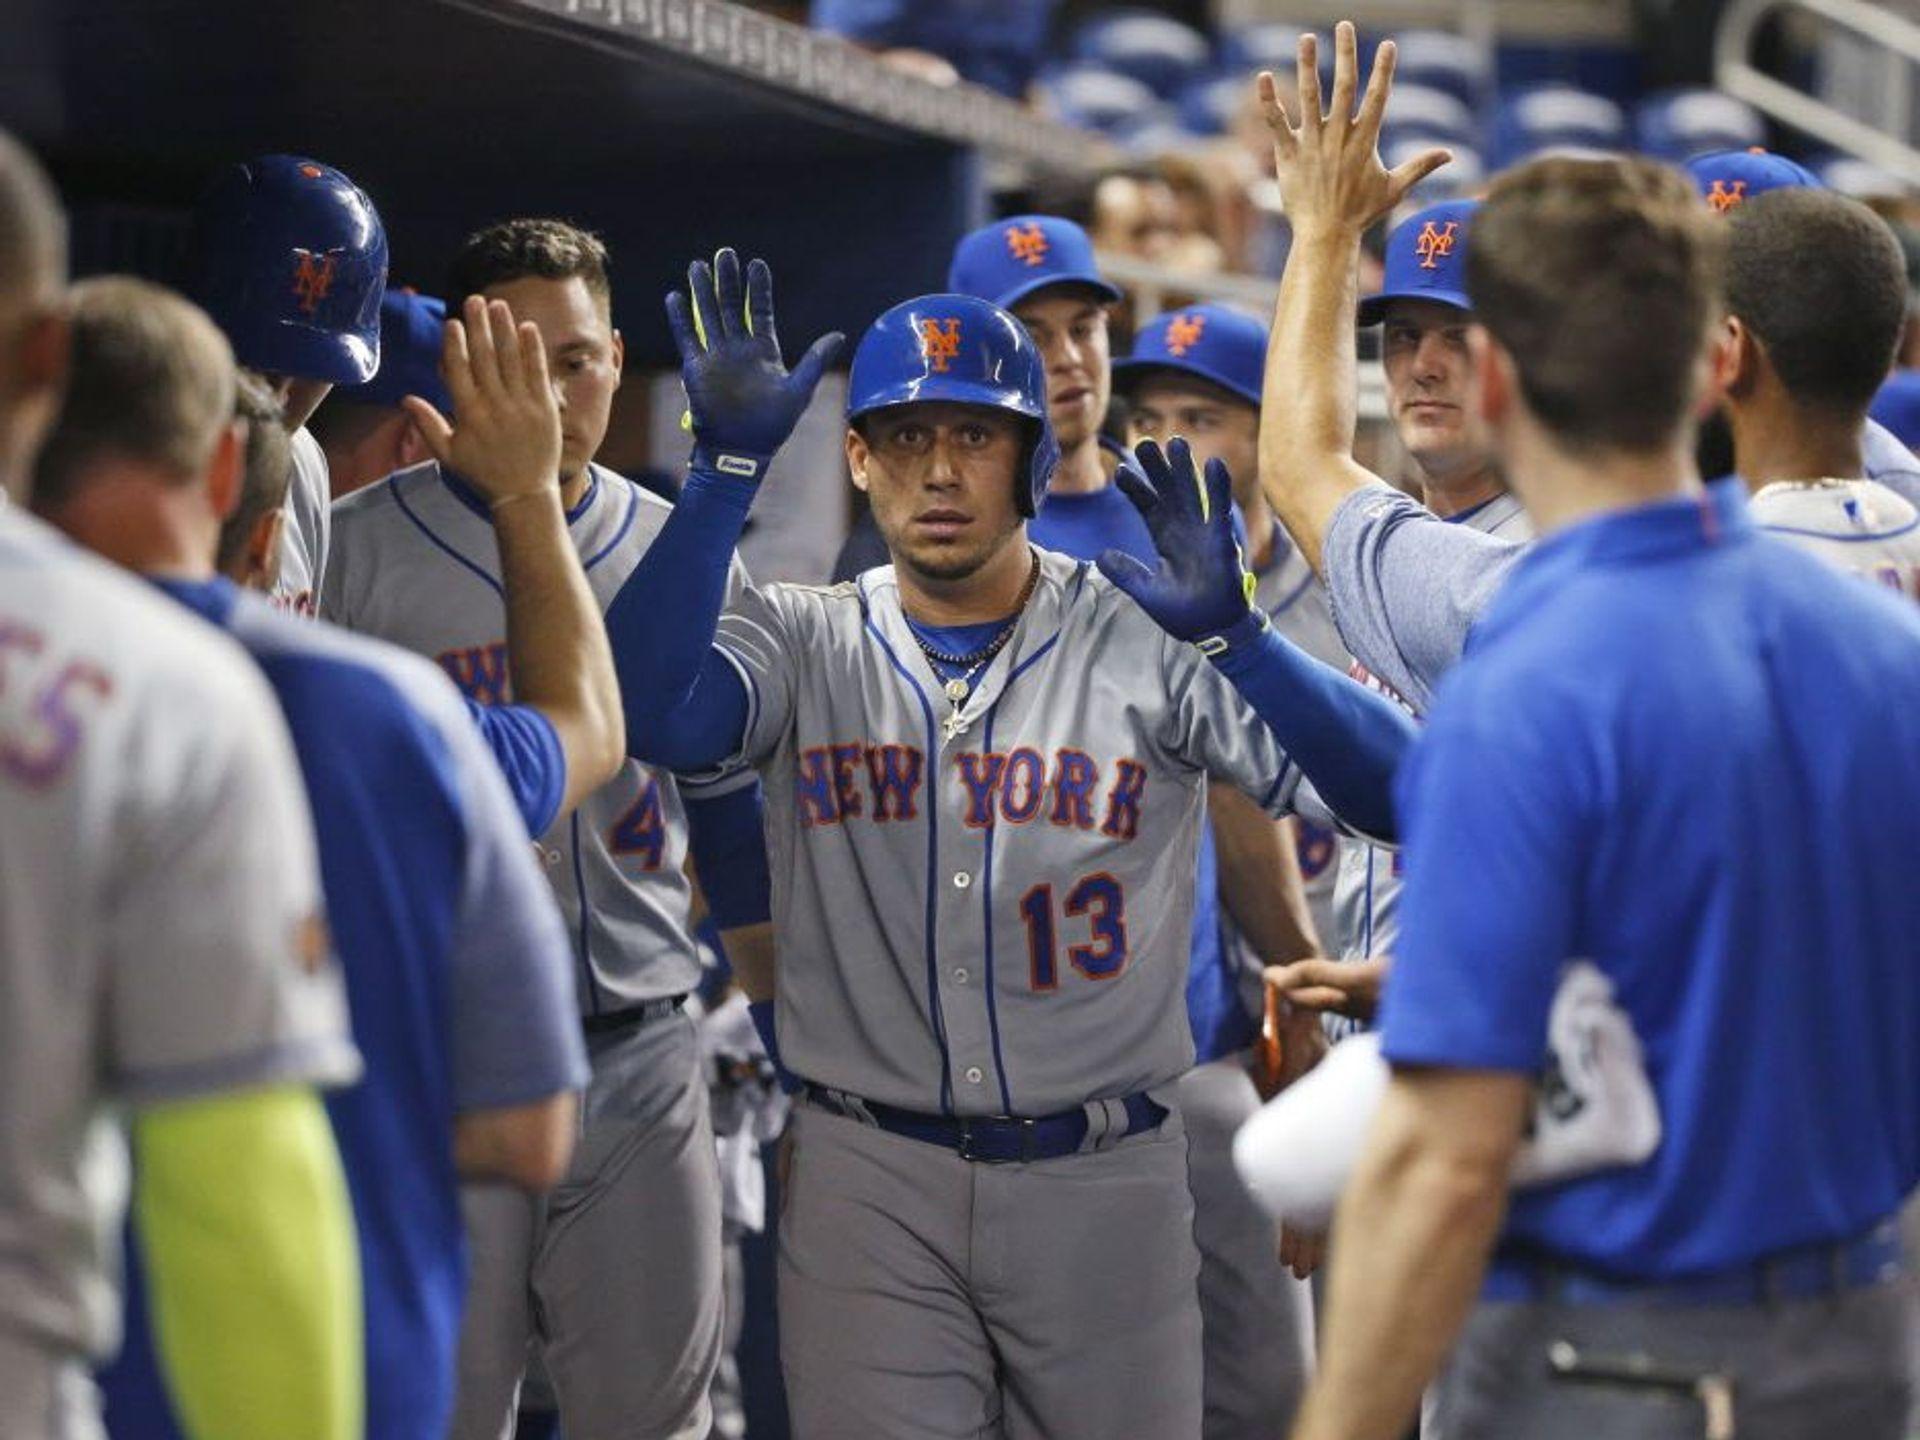 Yankees slugger Aaron Judge 'No need' to defend Home Run